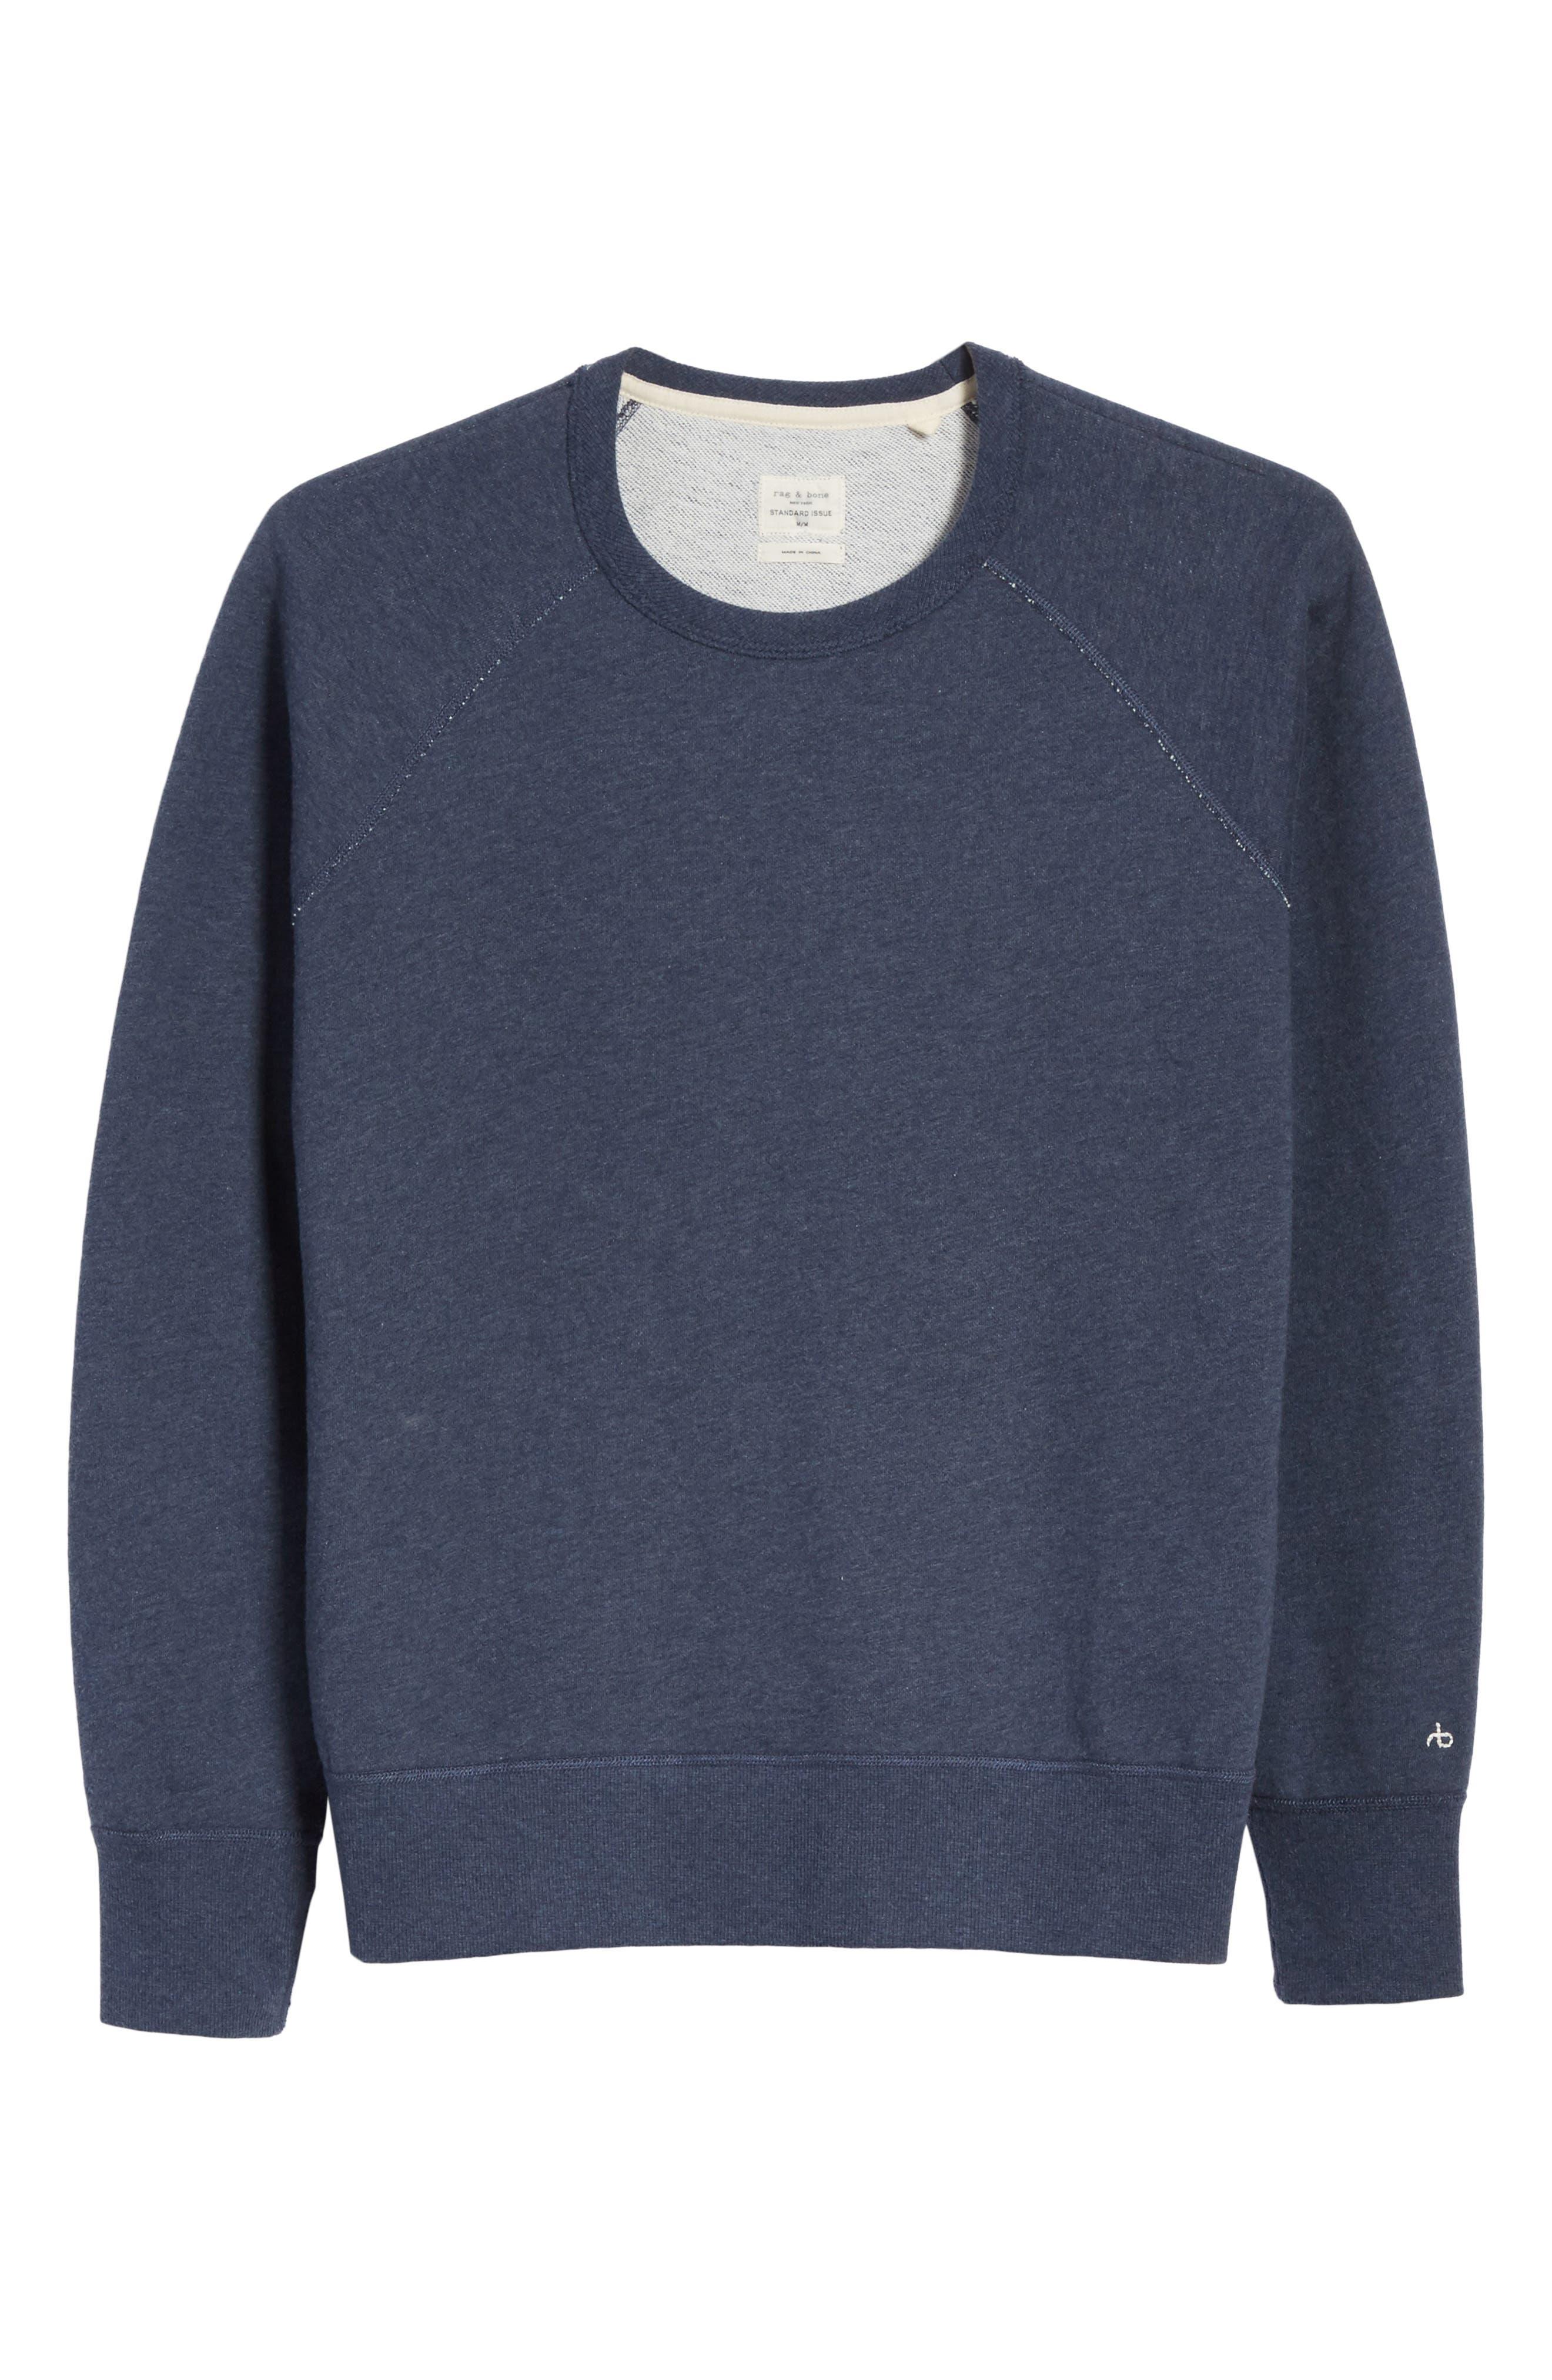 Standard Issue Crewneck Sweatshirt,                             Alternate thumbnail 18, color,